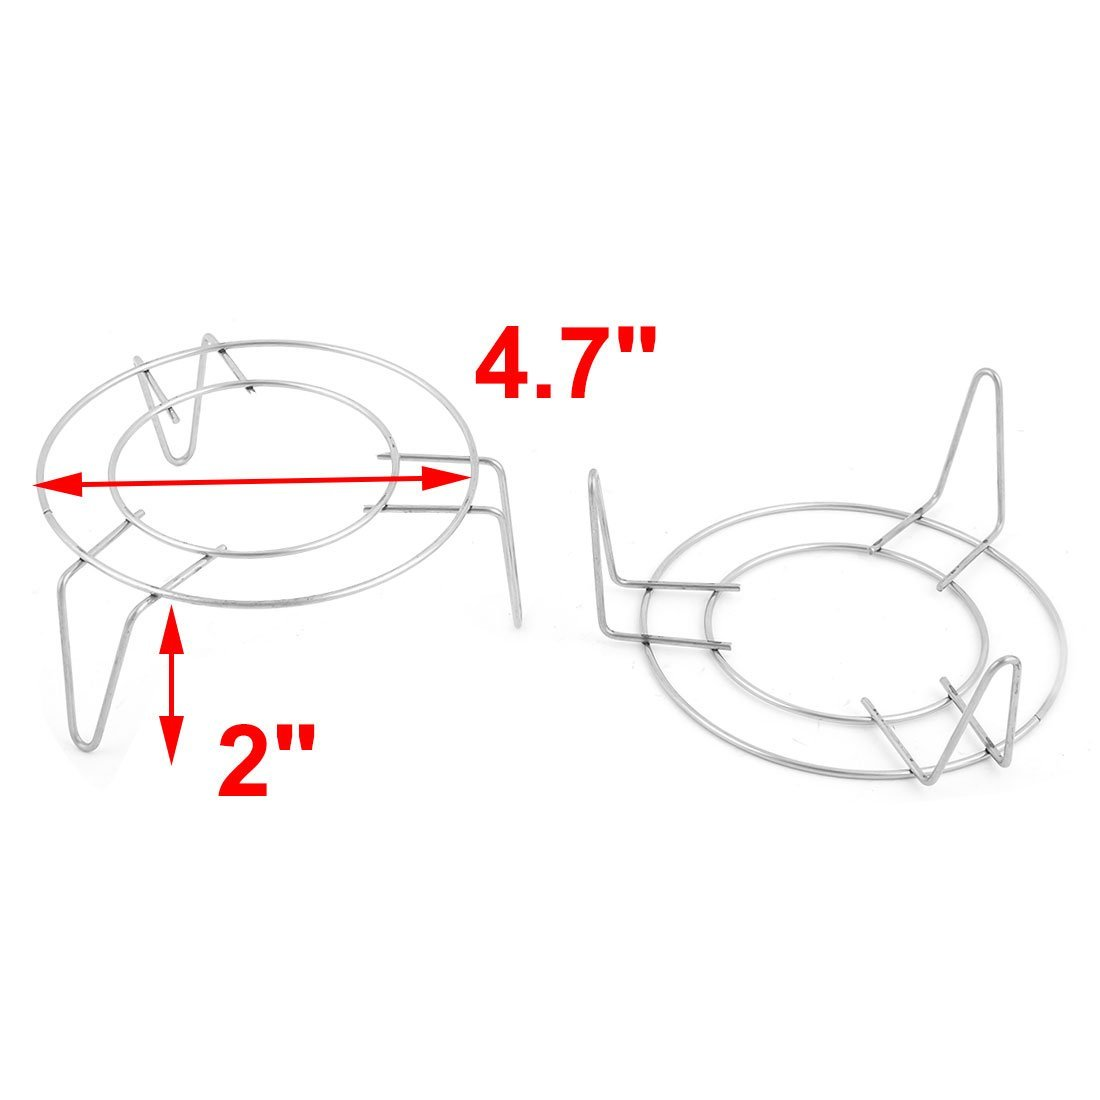 Amazon.com: eDealMax acero inoxidable Inicio 3 piernas Diseño Estante de alimentos al vapor Vapor soporte 12cm 2pcs Dia: Kitchen & Dining